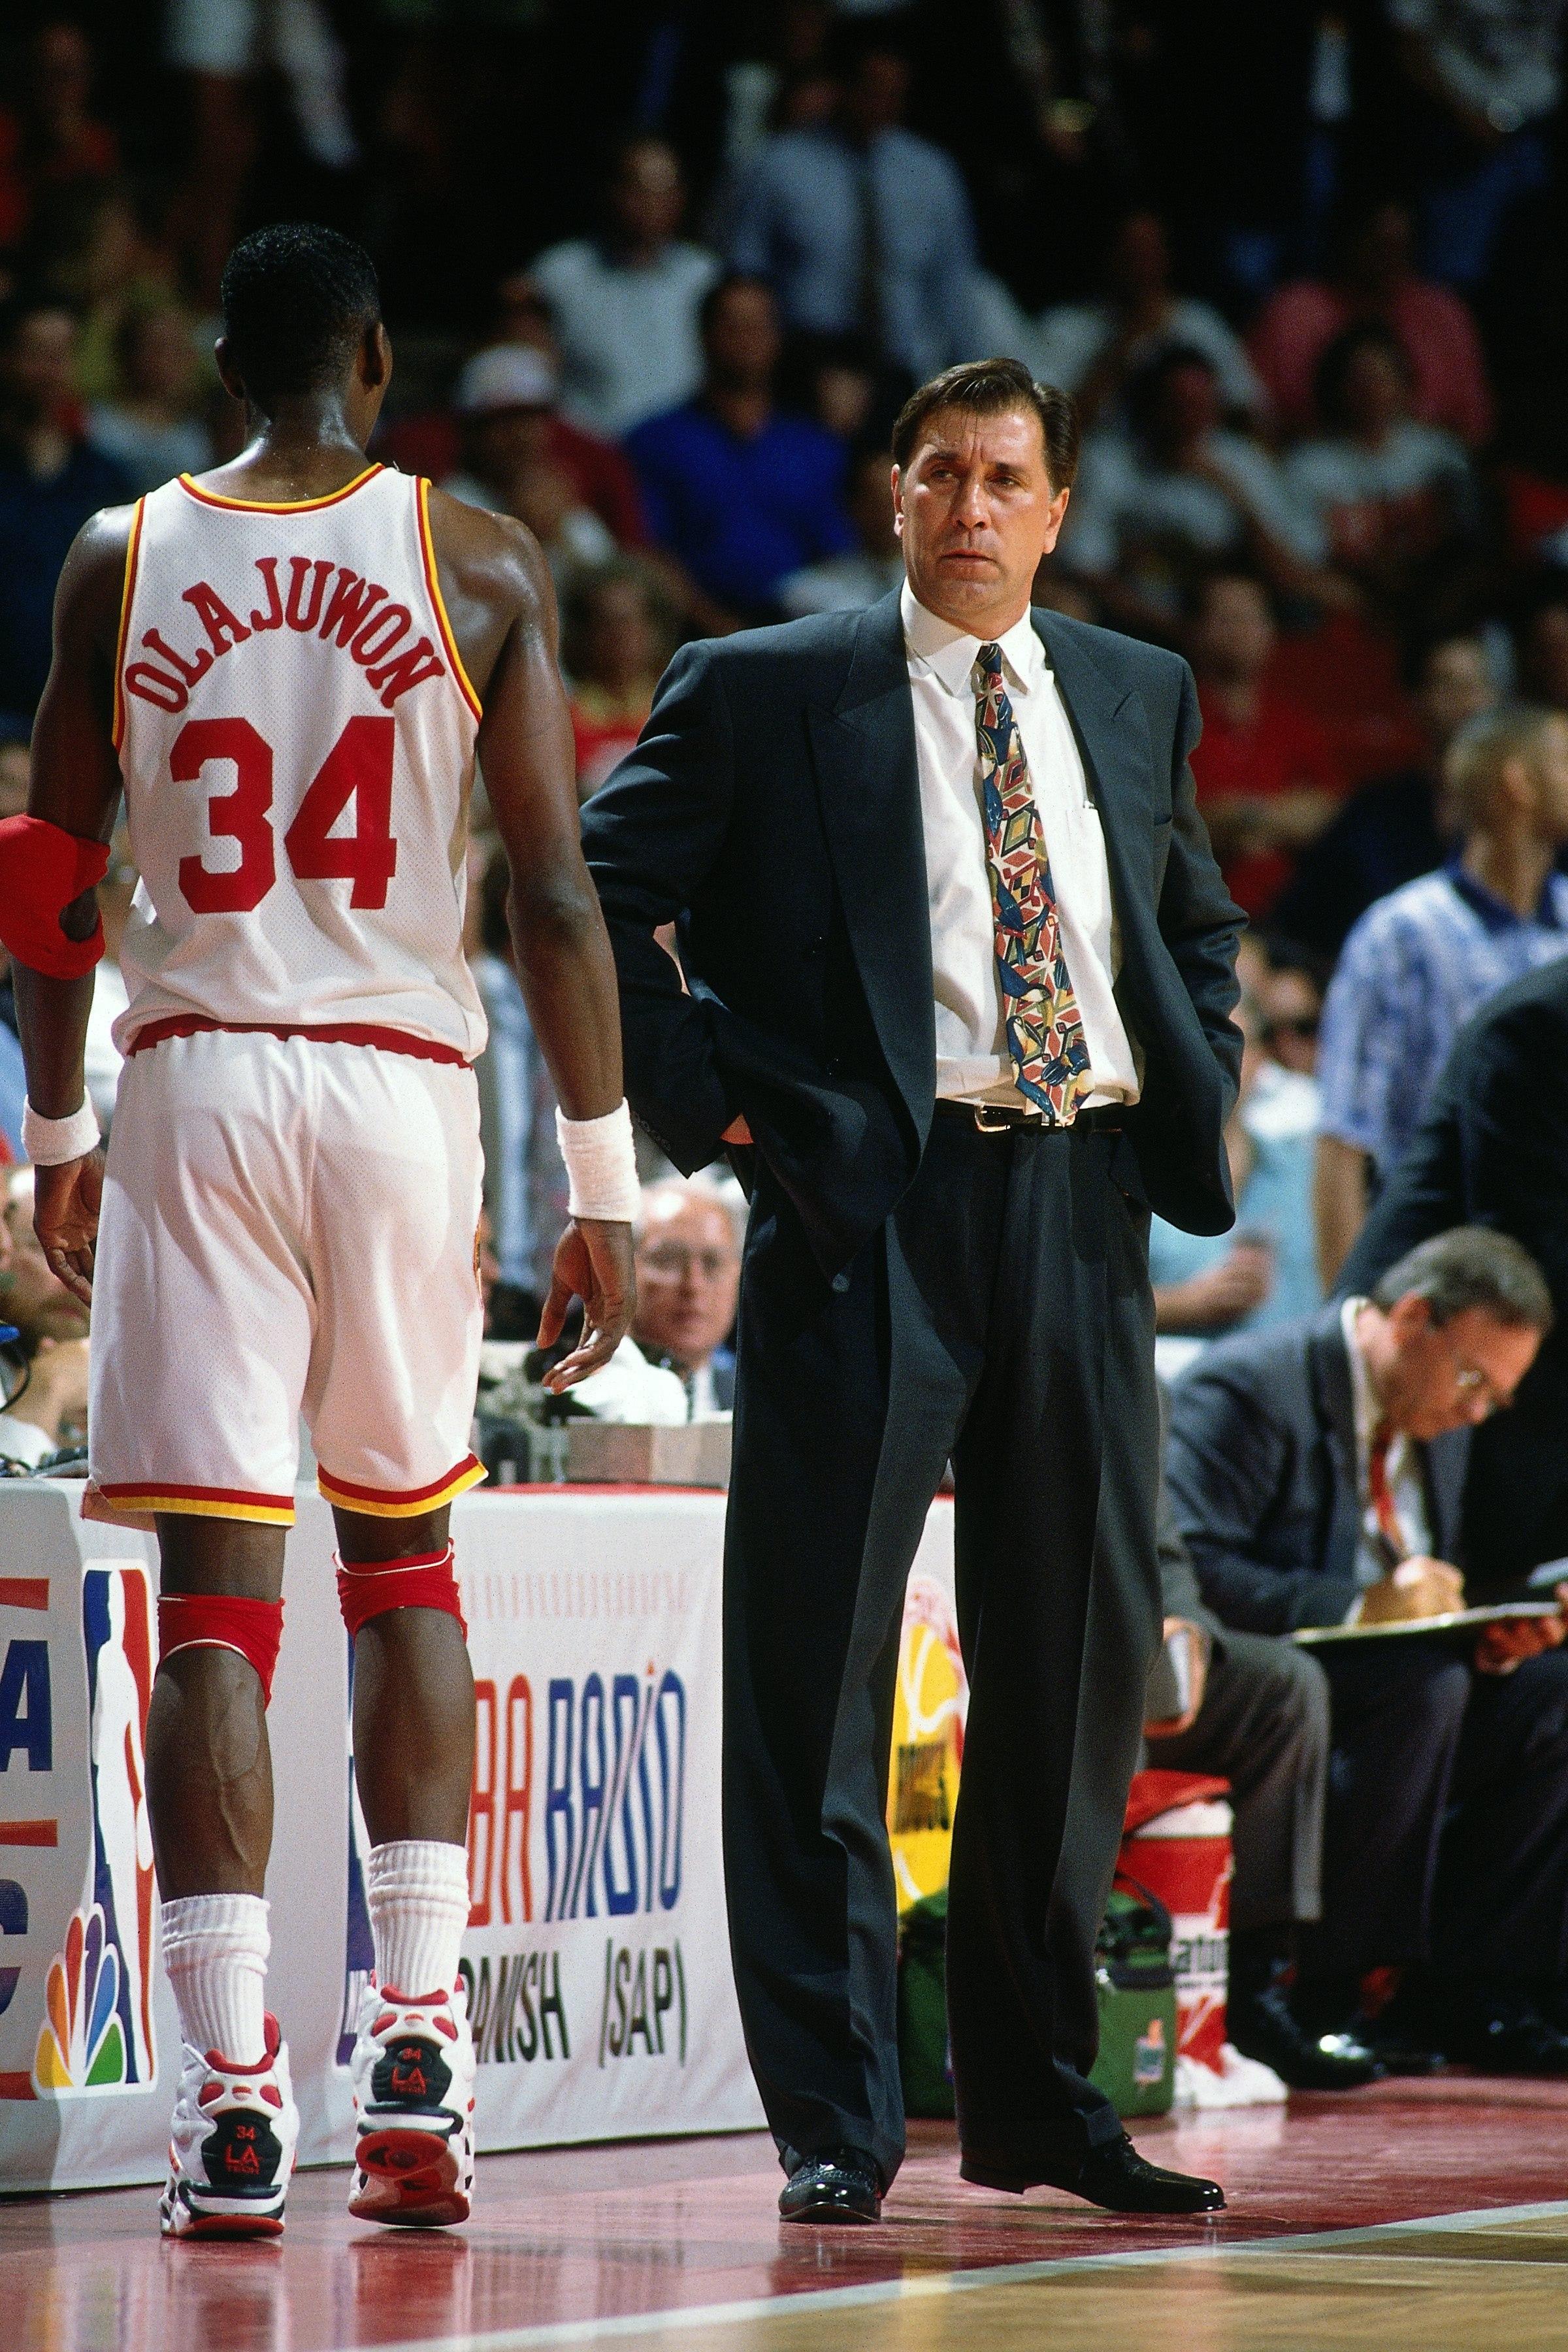 1994 NBA Finals Game 1: New York Knicks vs. Houston Rockets